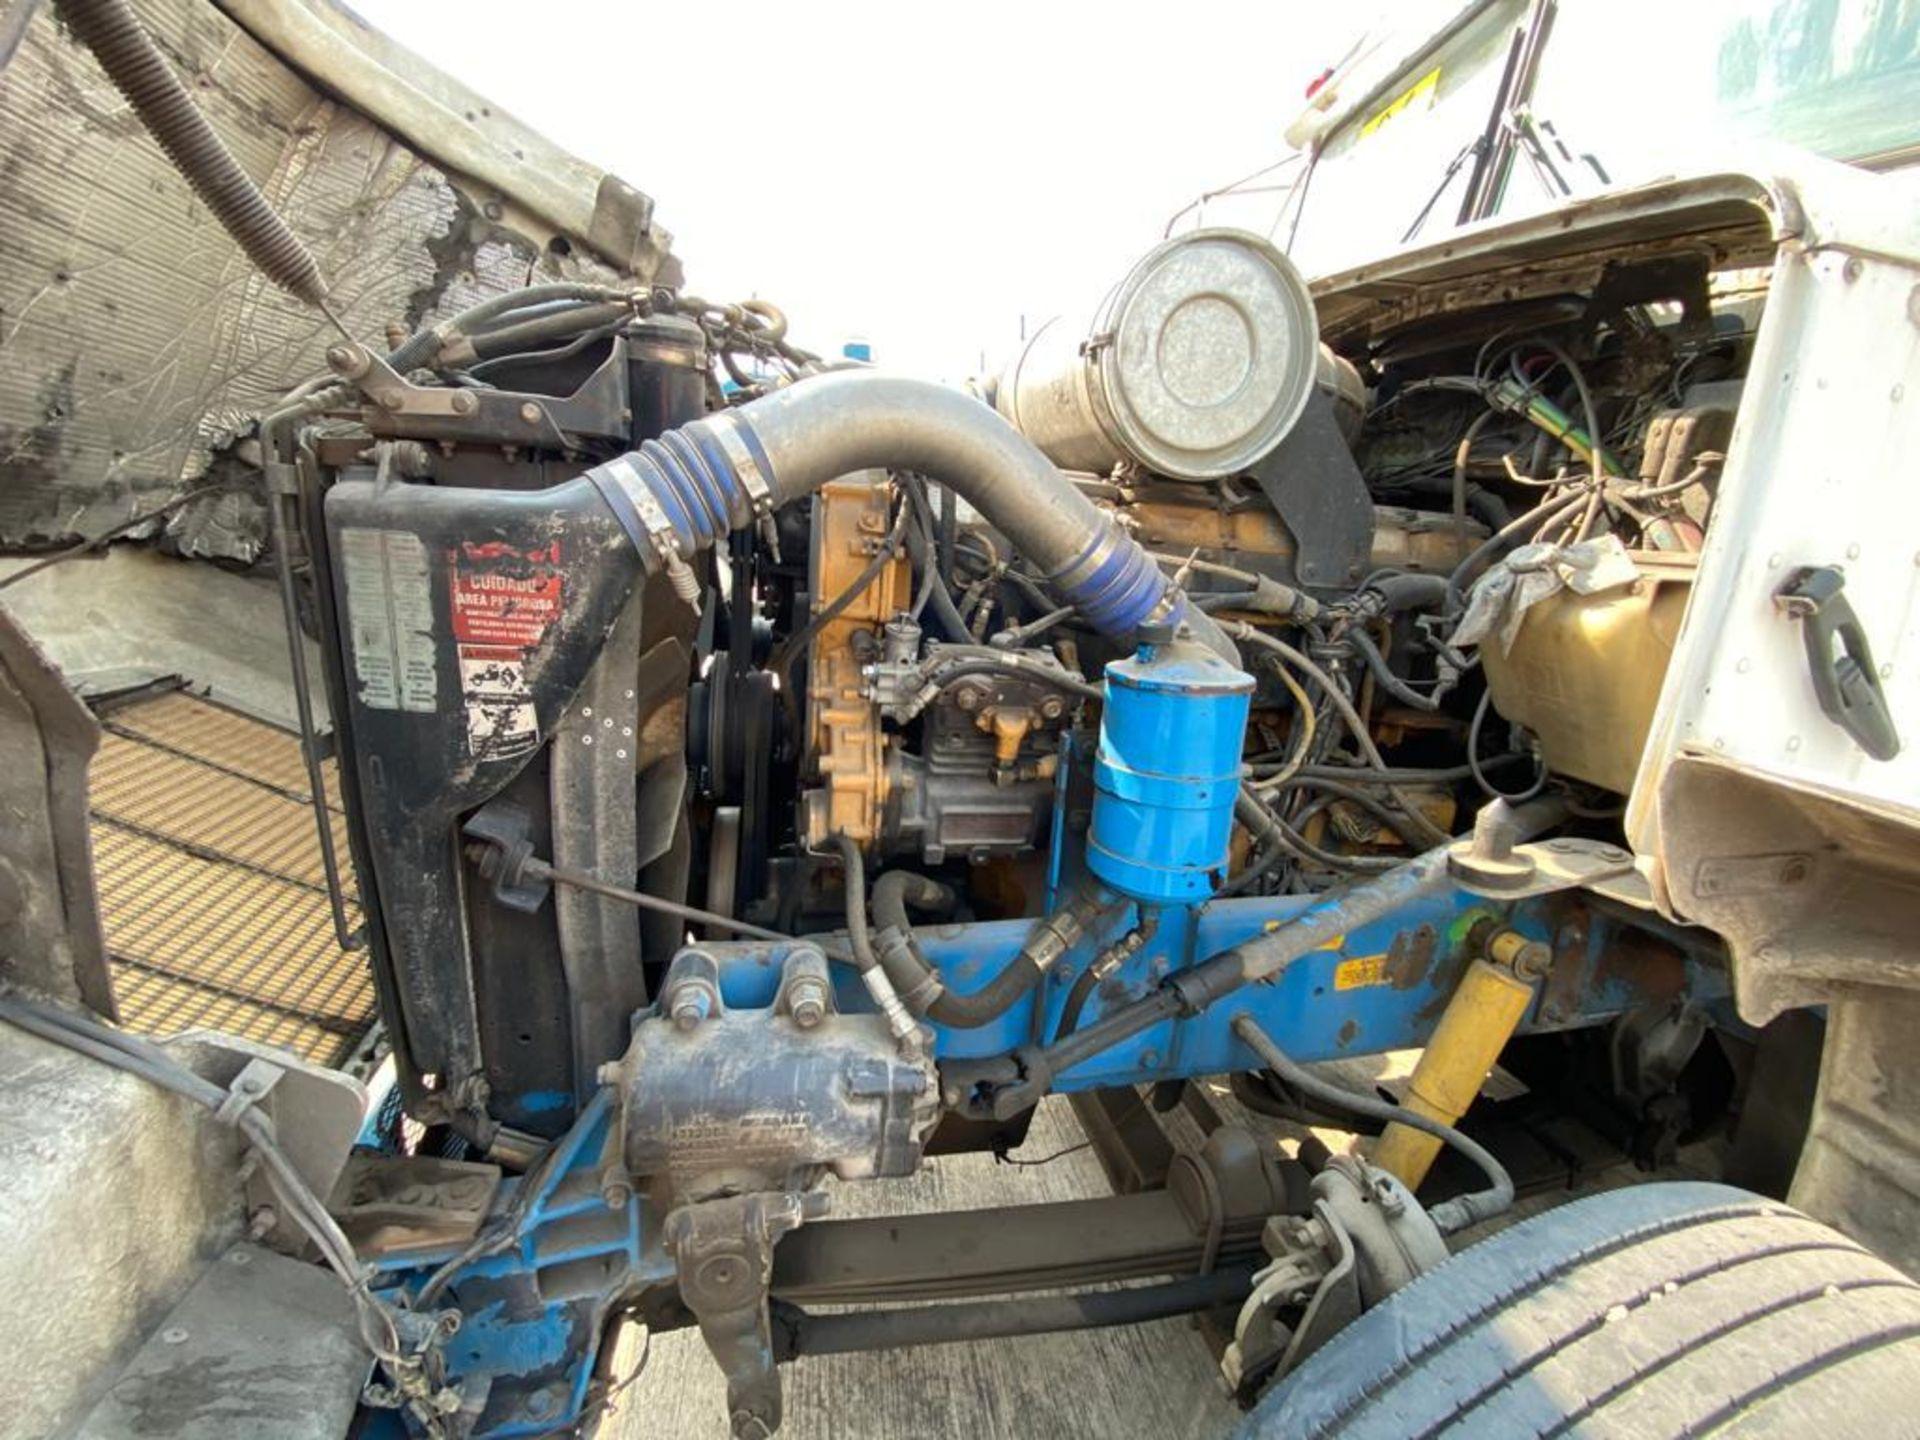 1998 Kenworth Sleeper truck tractor, standard transmission of 18 speeds - Image 74 of 75